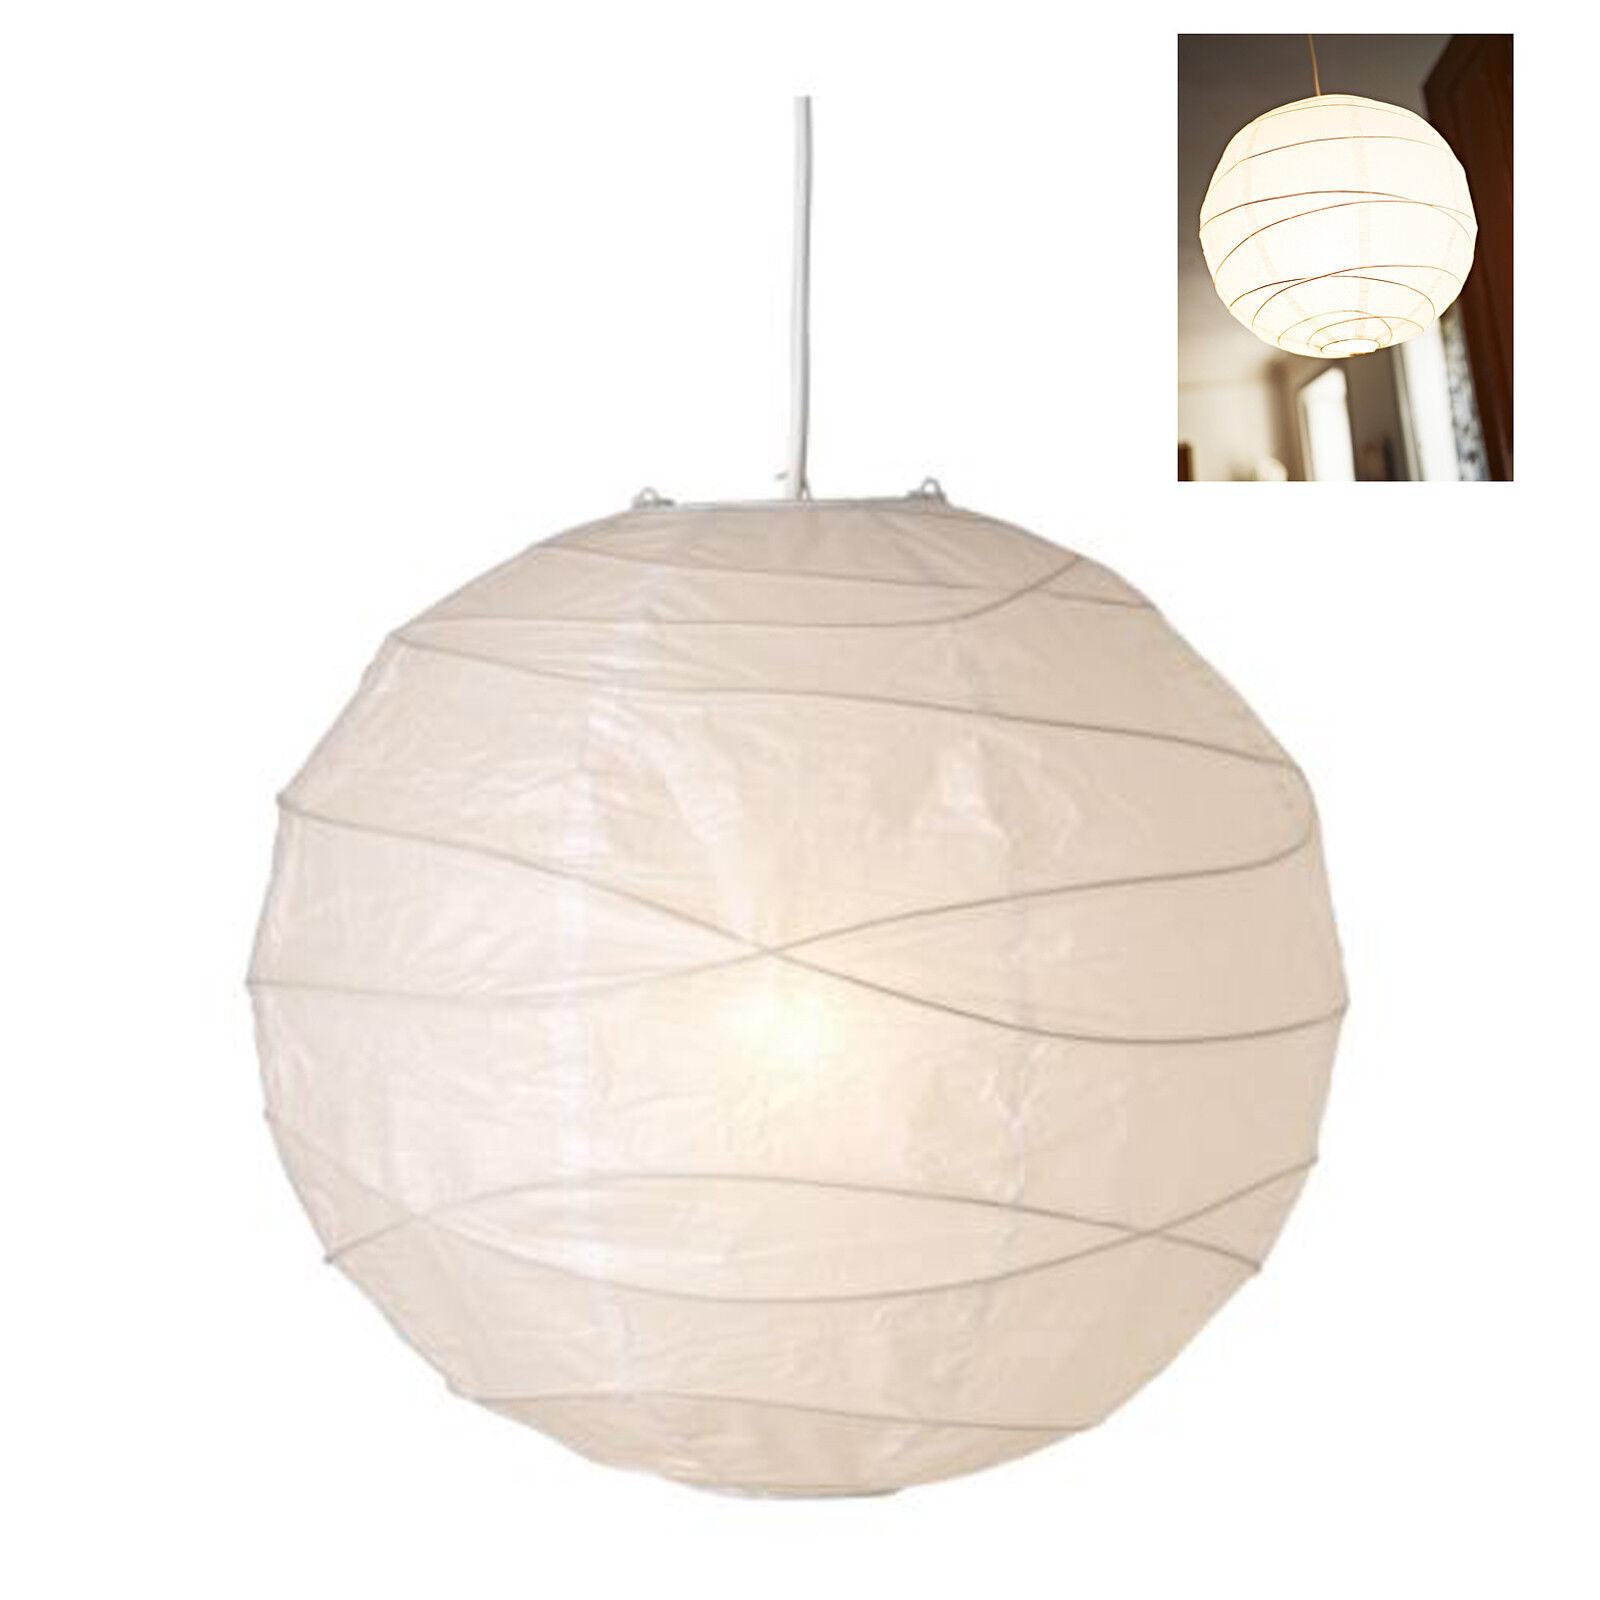 PARALUME CARTA DI RISO 45 CM DIAMETRO LAMPADA SOSPENSIONE IKEA REGOLIT